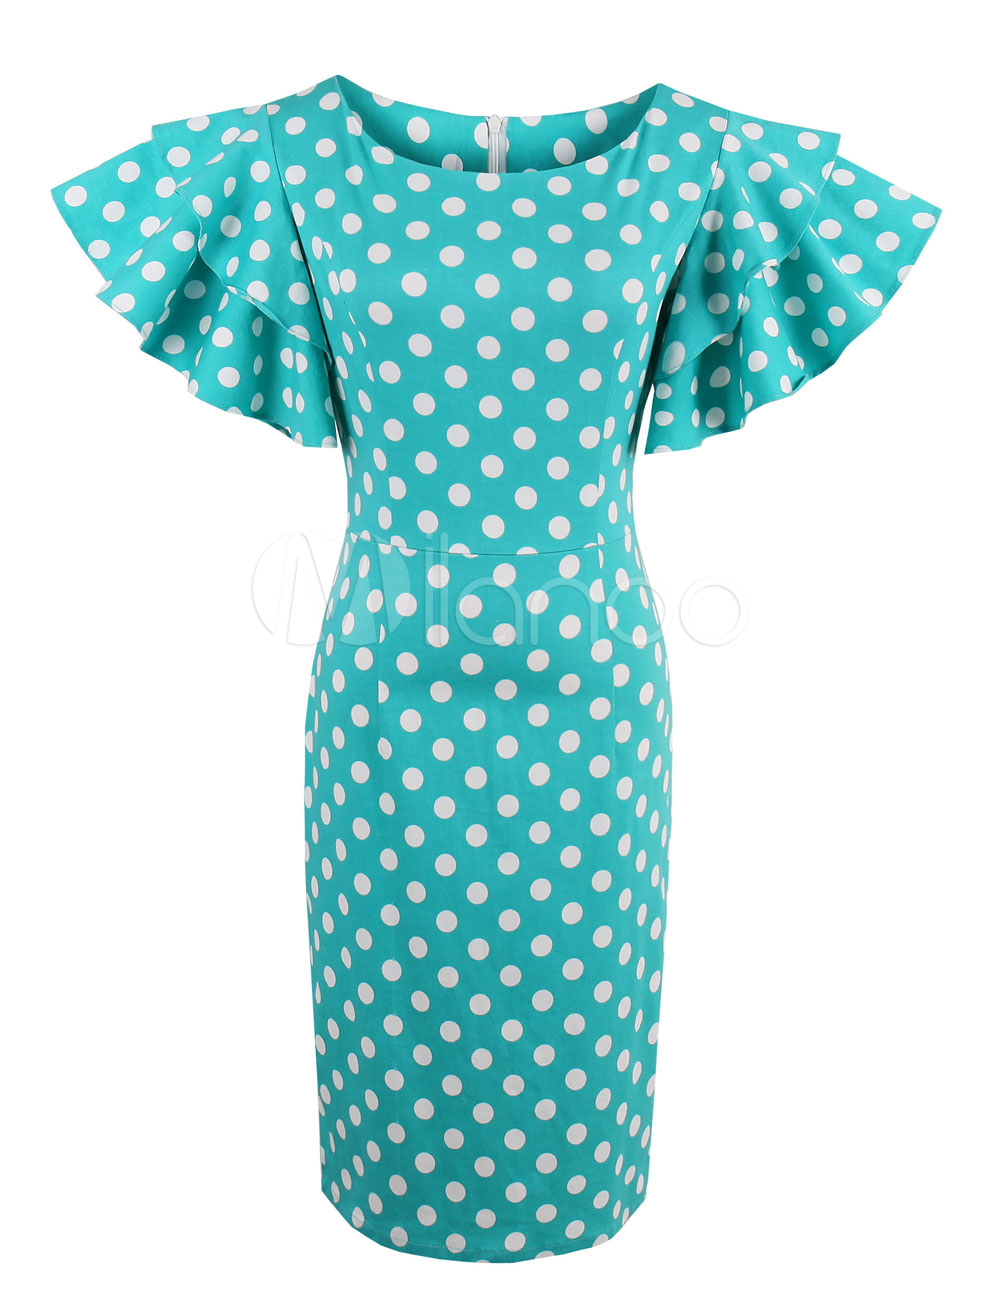 Buy Women's Vintage Dress Polka Dot Round Neck Short Sleeve Ruffles Blue Green Sheath Dress for $28.49 in Milanoo store